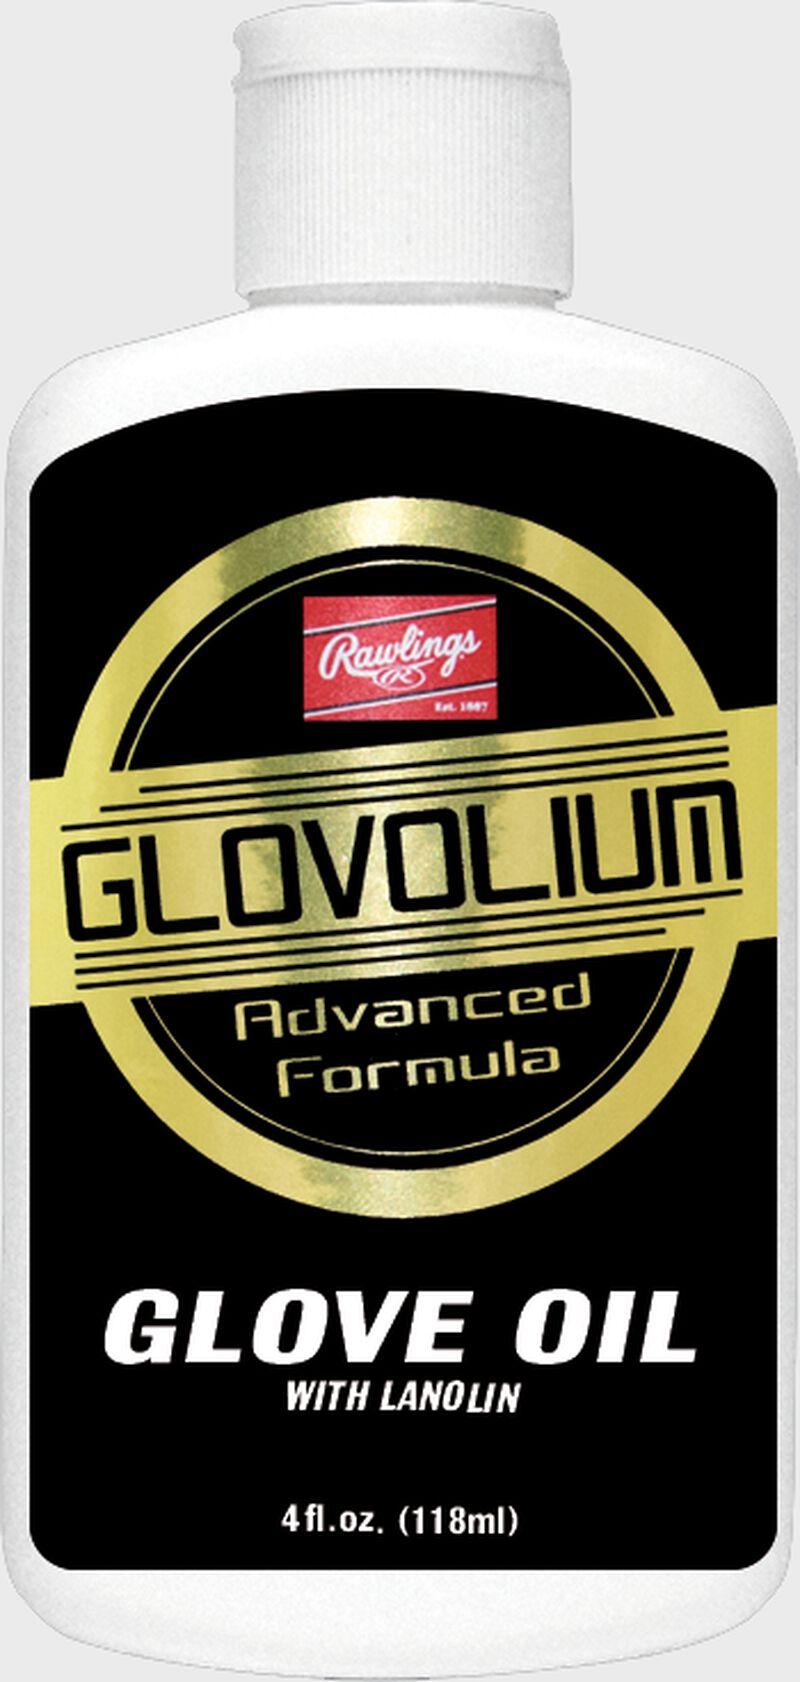 A bottle of Glovolium Glove Oil advanced formula for glove maintenance SKU #G25GIIBP